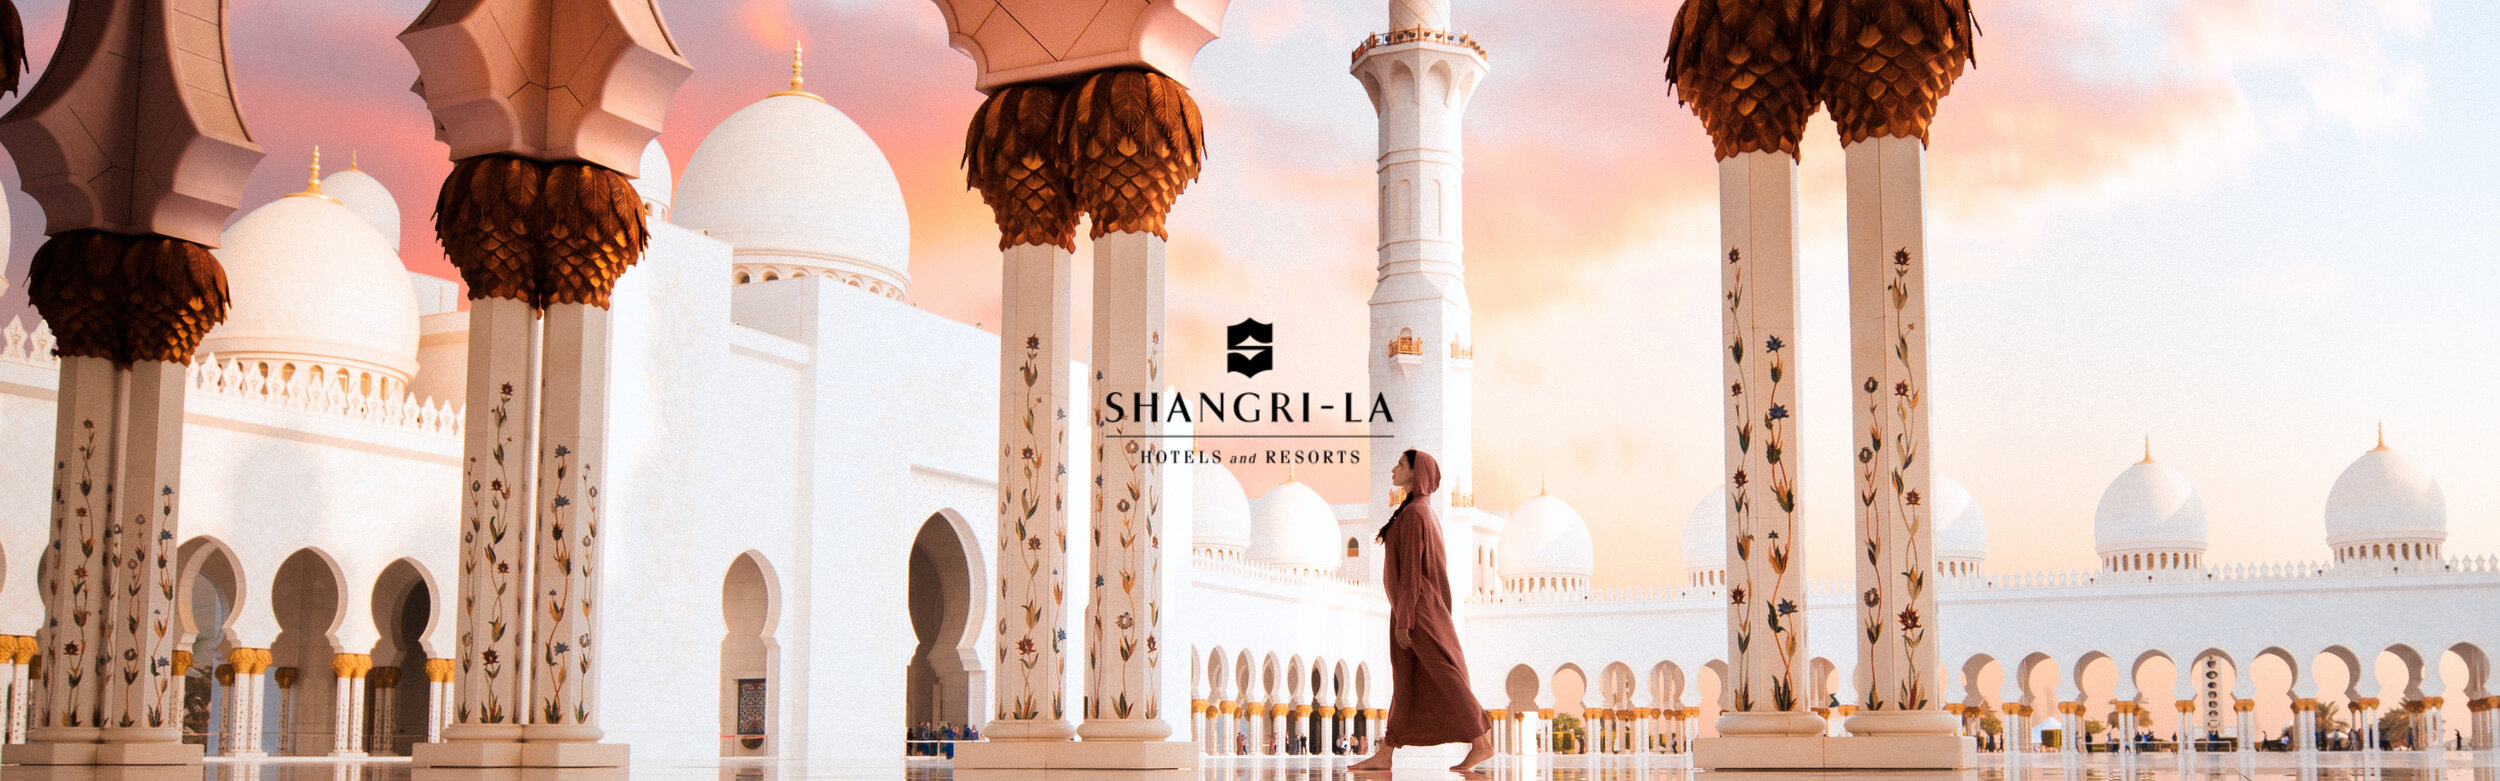 Shangrila Resorts_00000.jpg